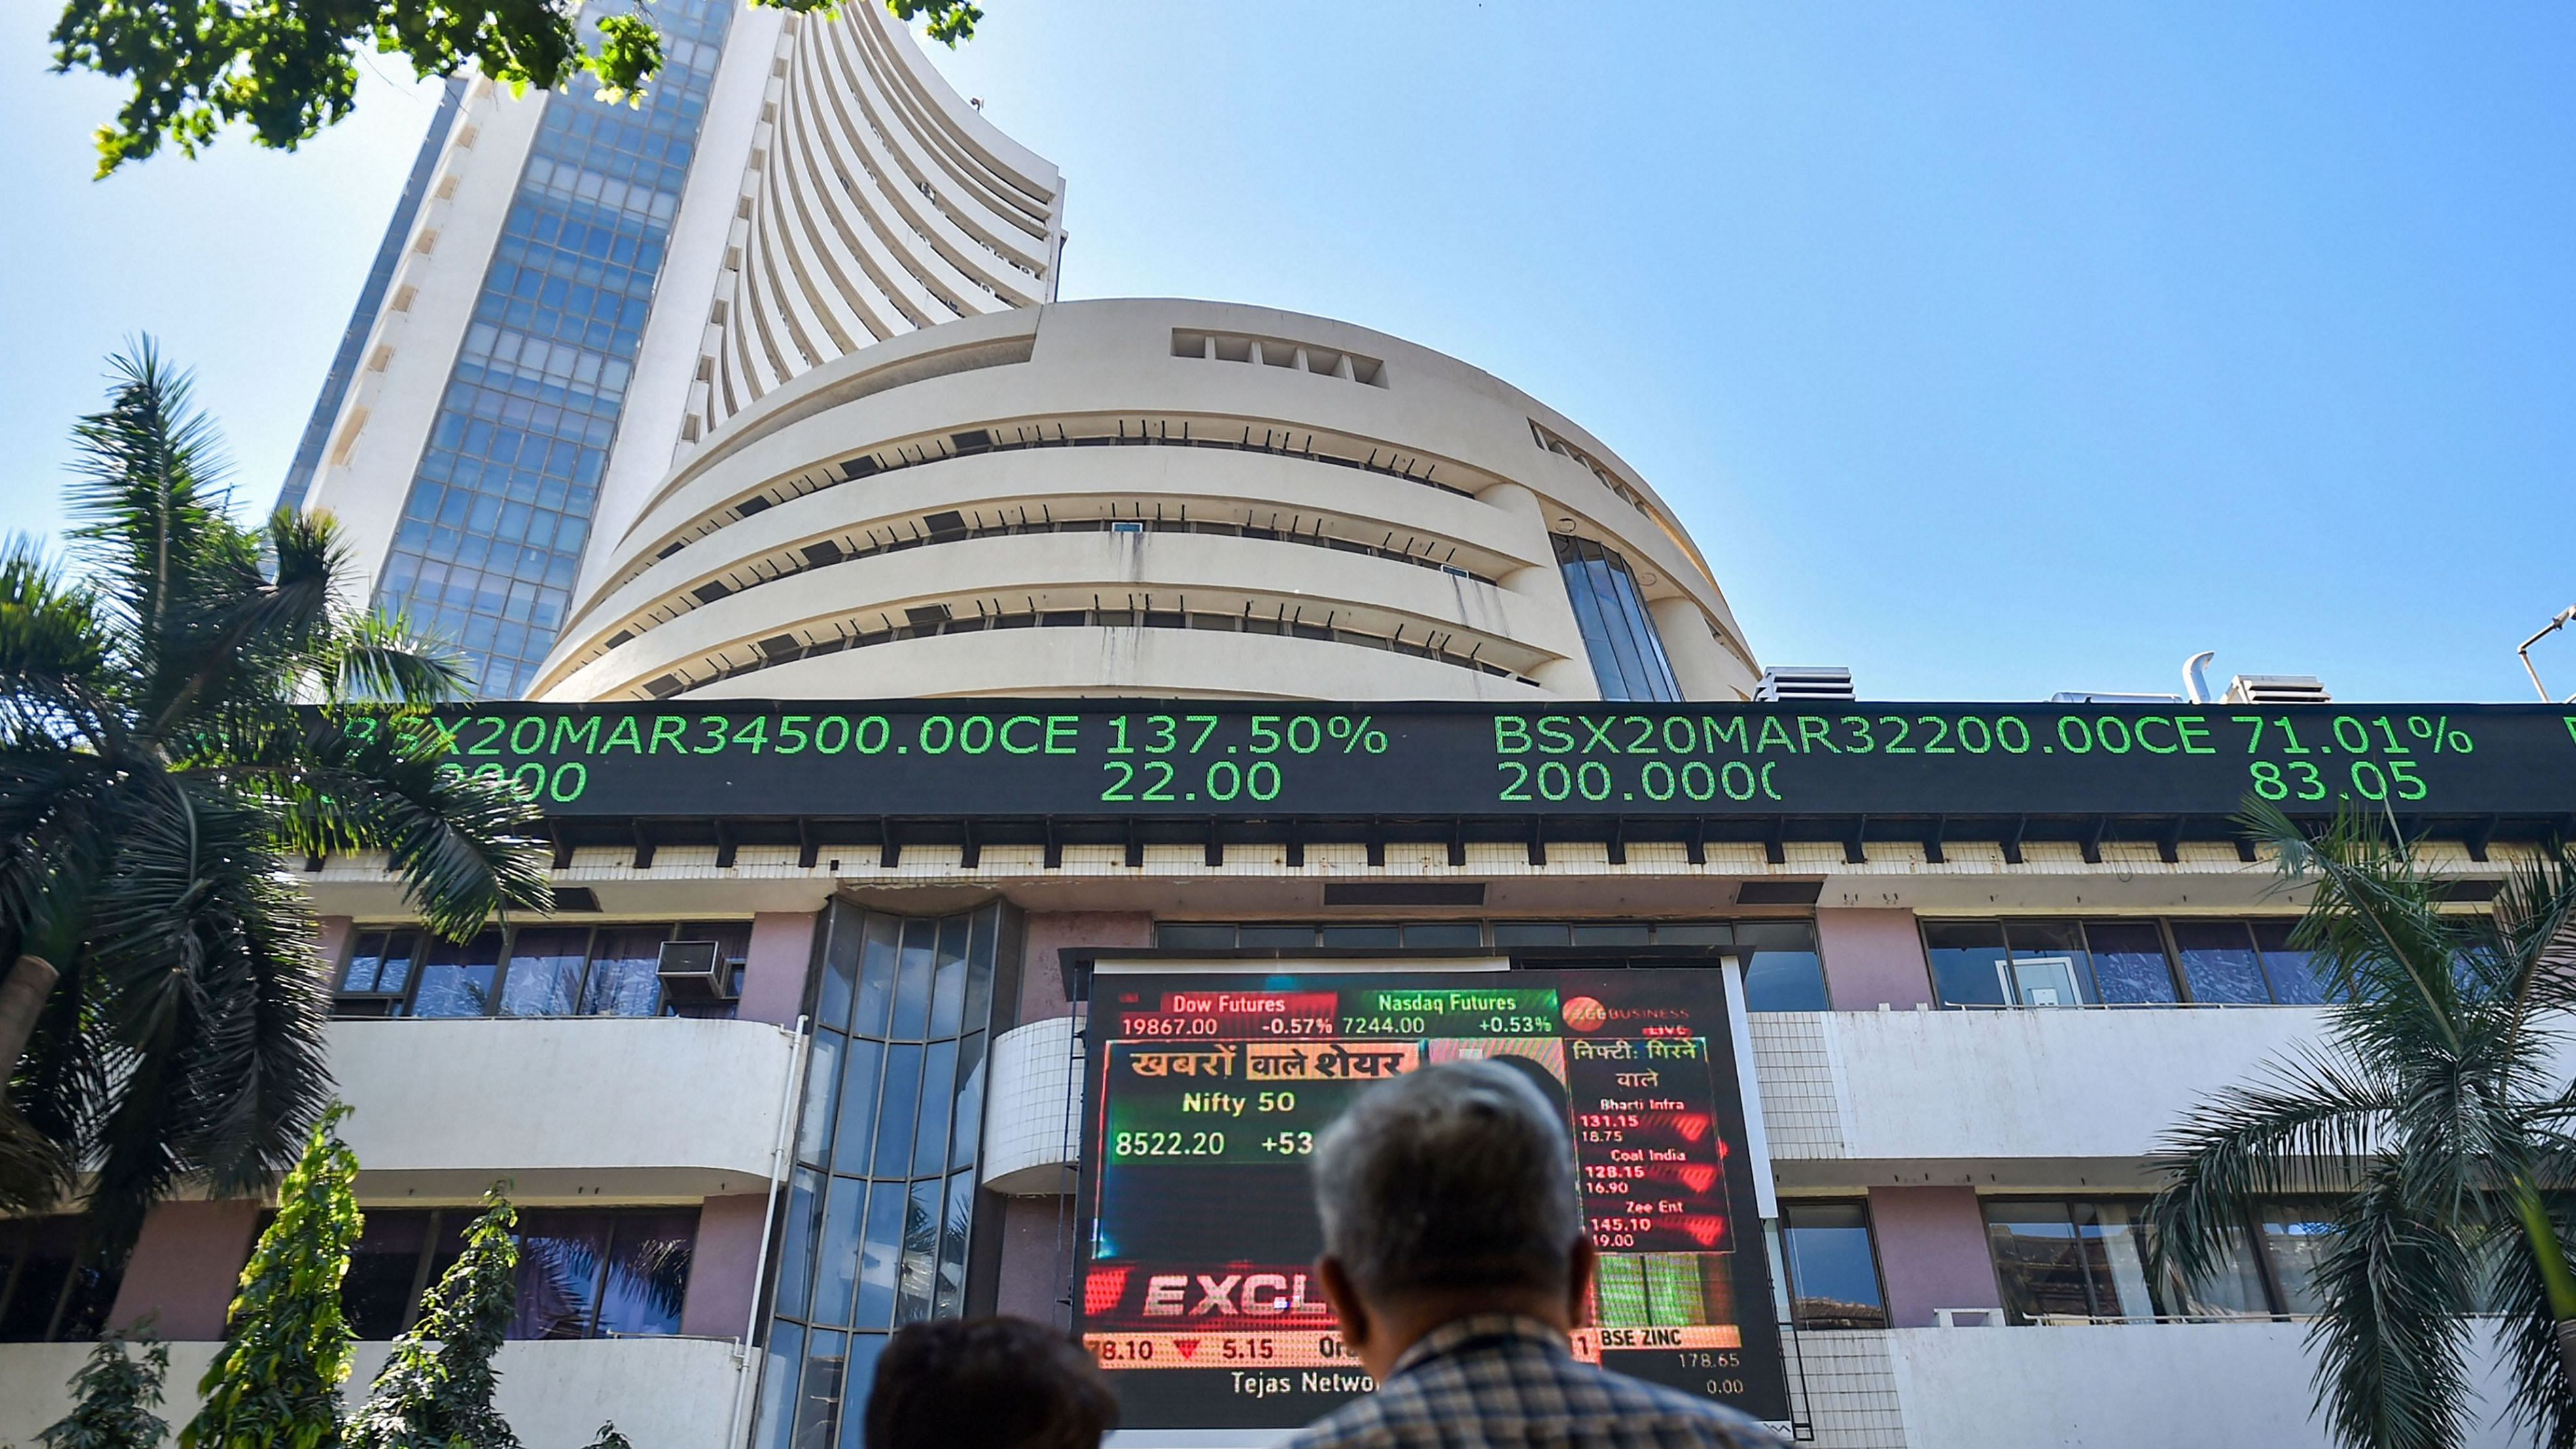 Sensex rallies over 500 points to hit new peak